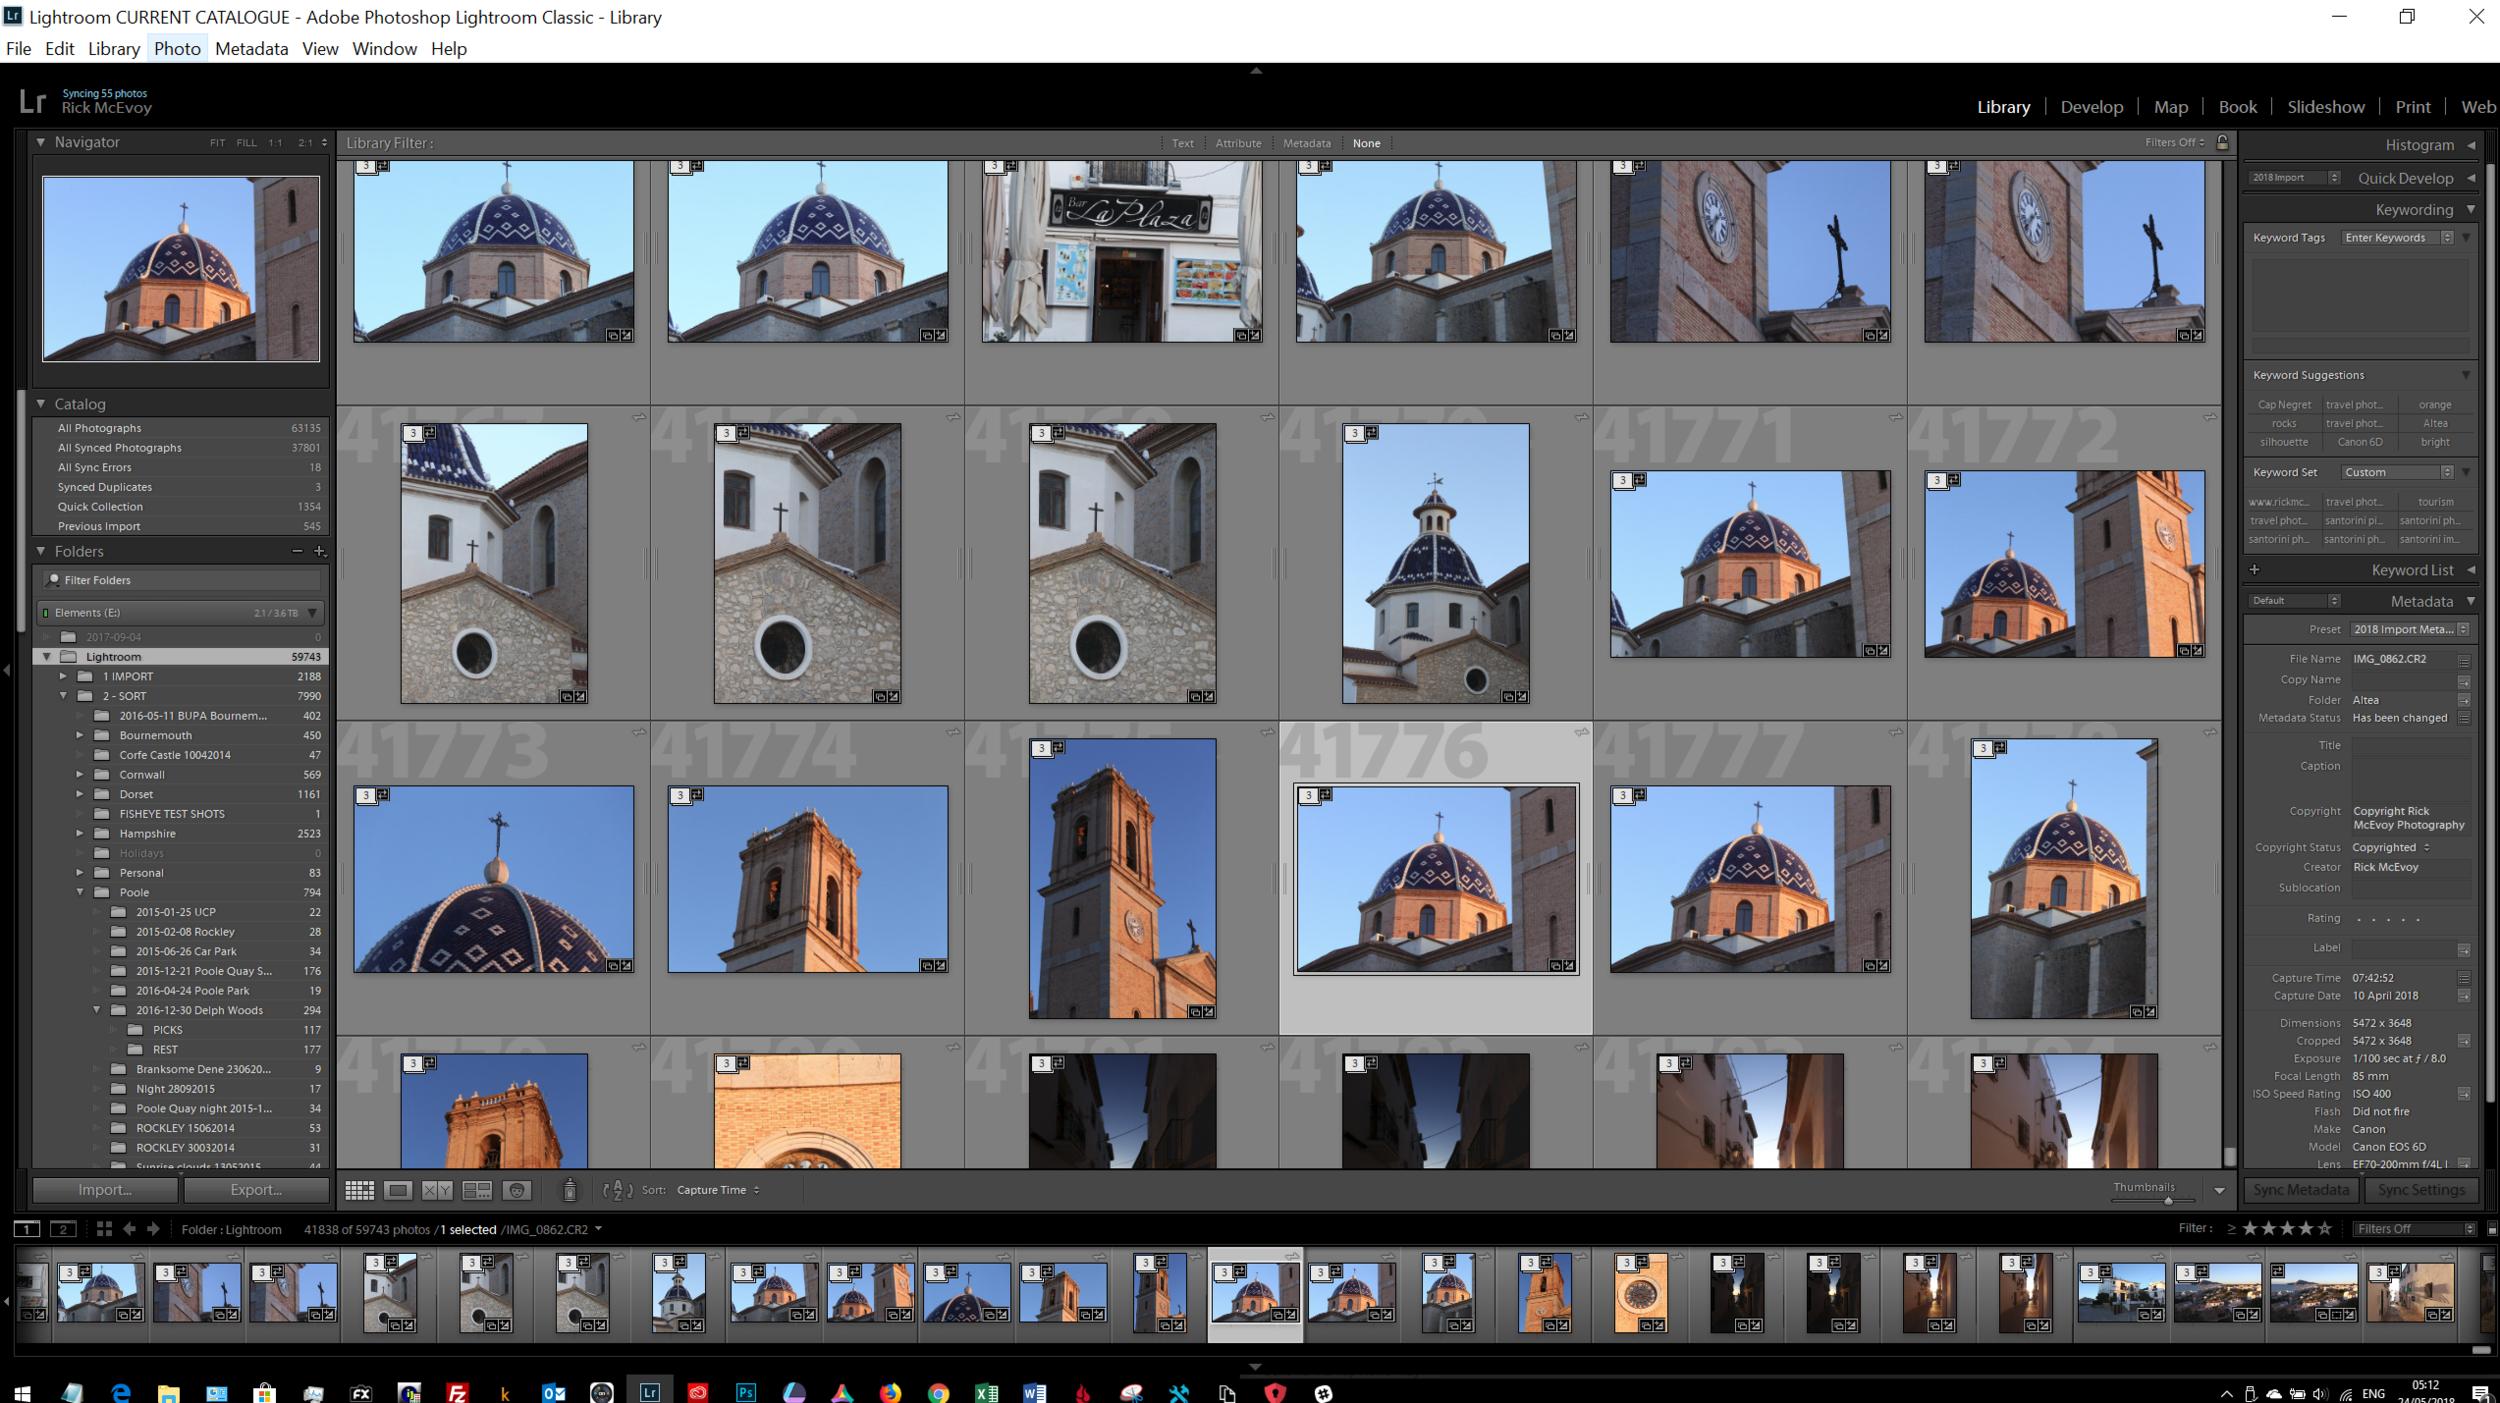 Adobe Lightroom Classic 7.3 on my PC